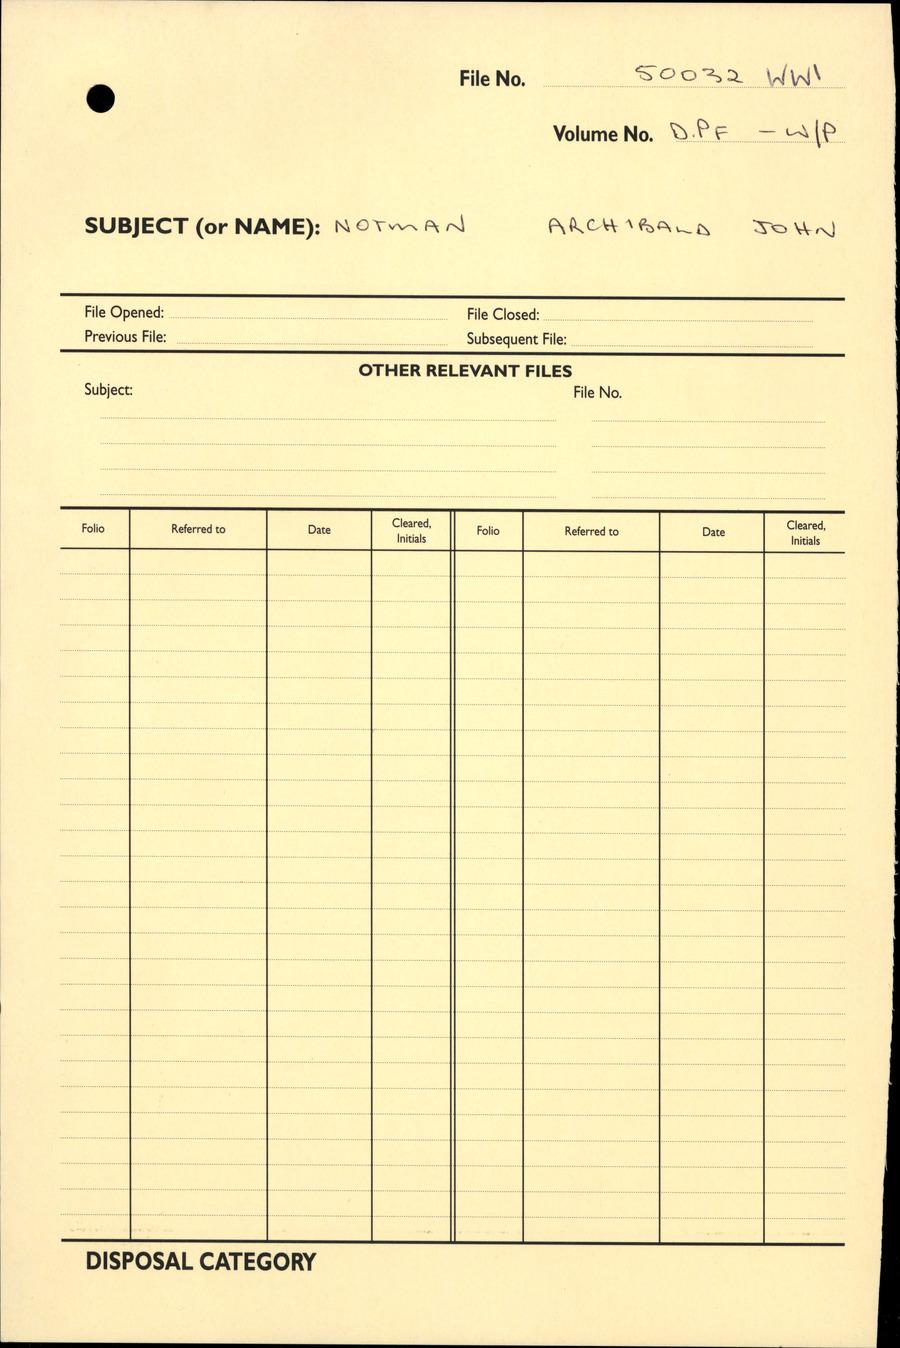 NOTMAN, Archibald John - WW1 50032 - DPF [Duplicate Personnel File]